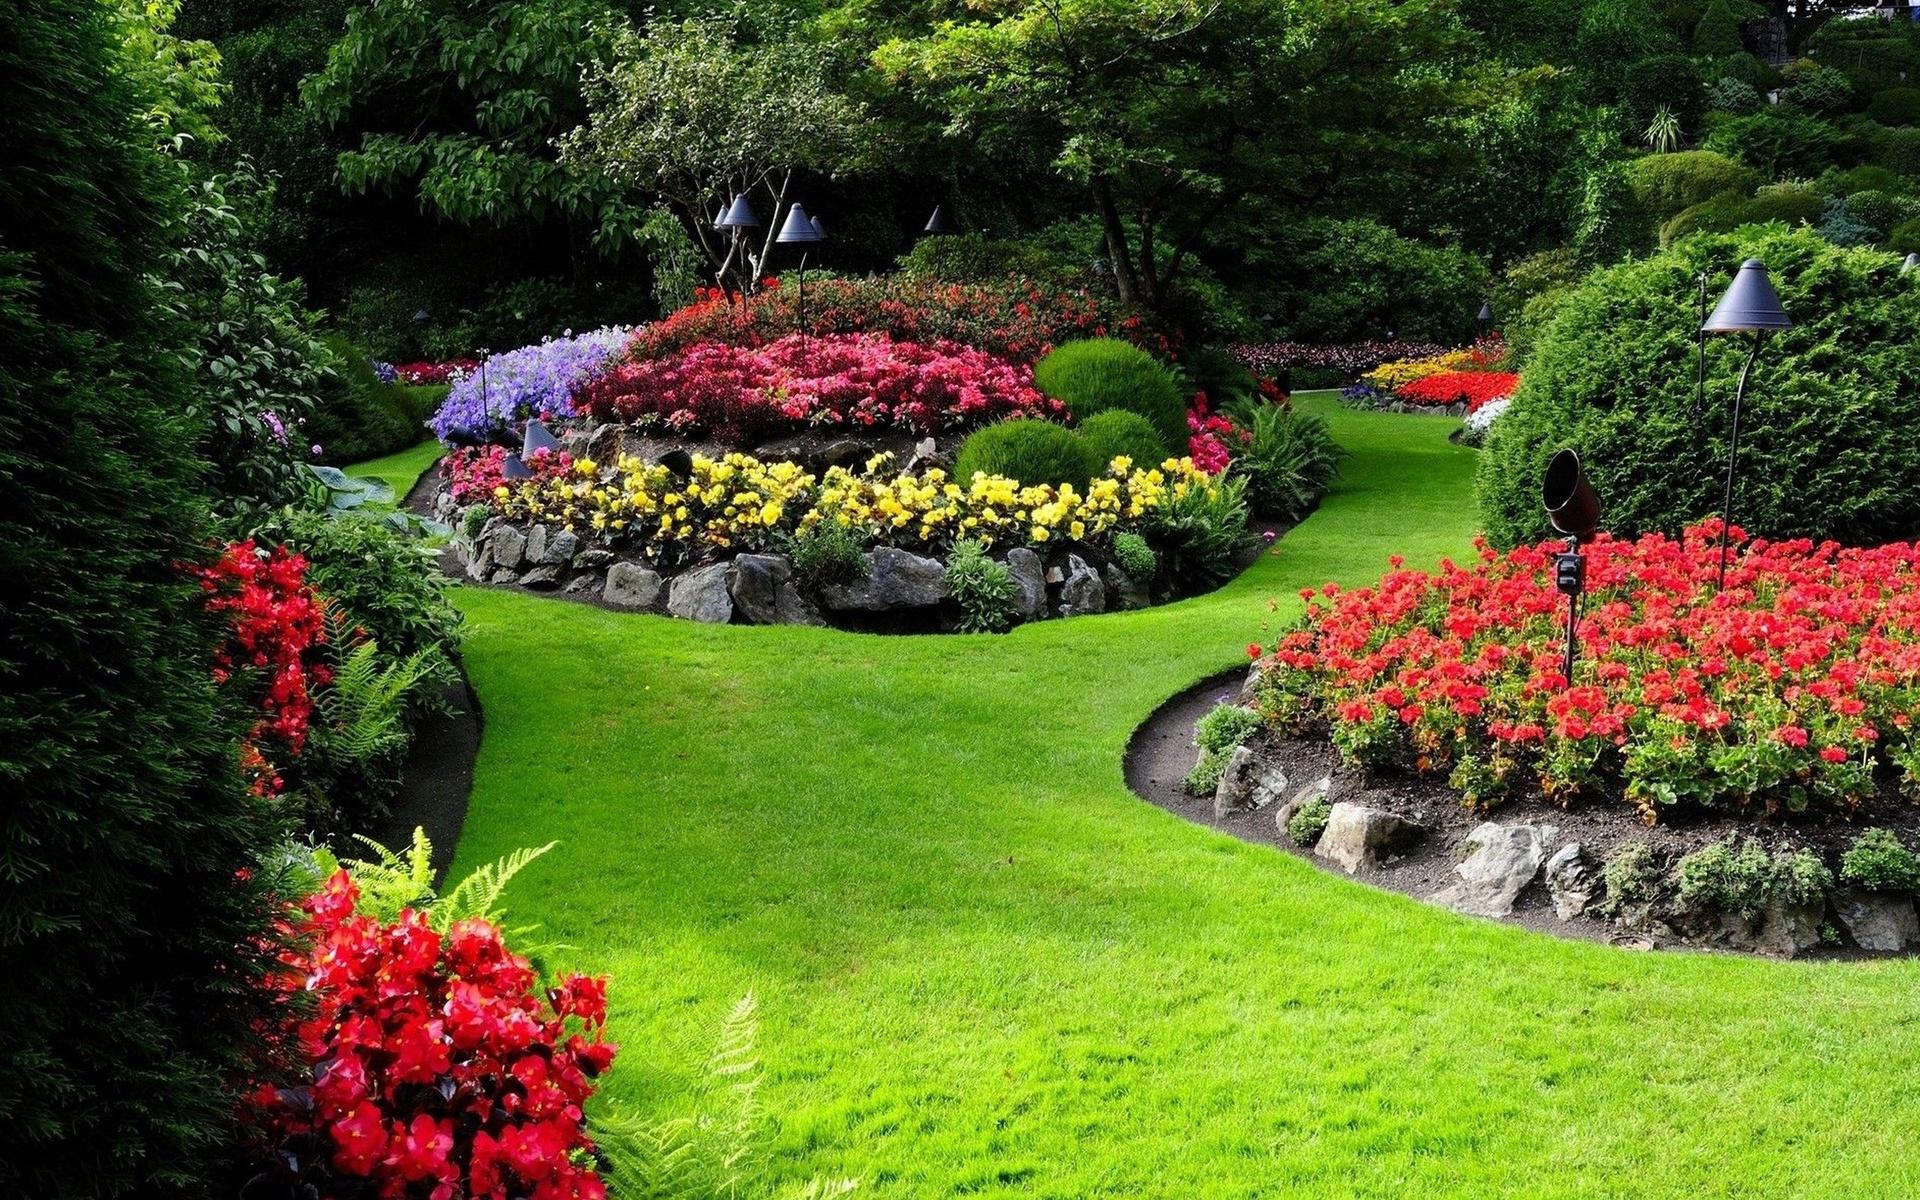 картинки цветы сады клумбы ничто